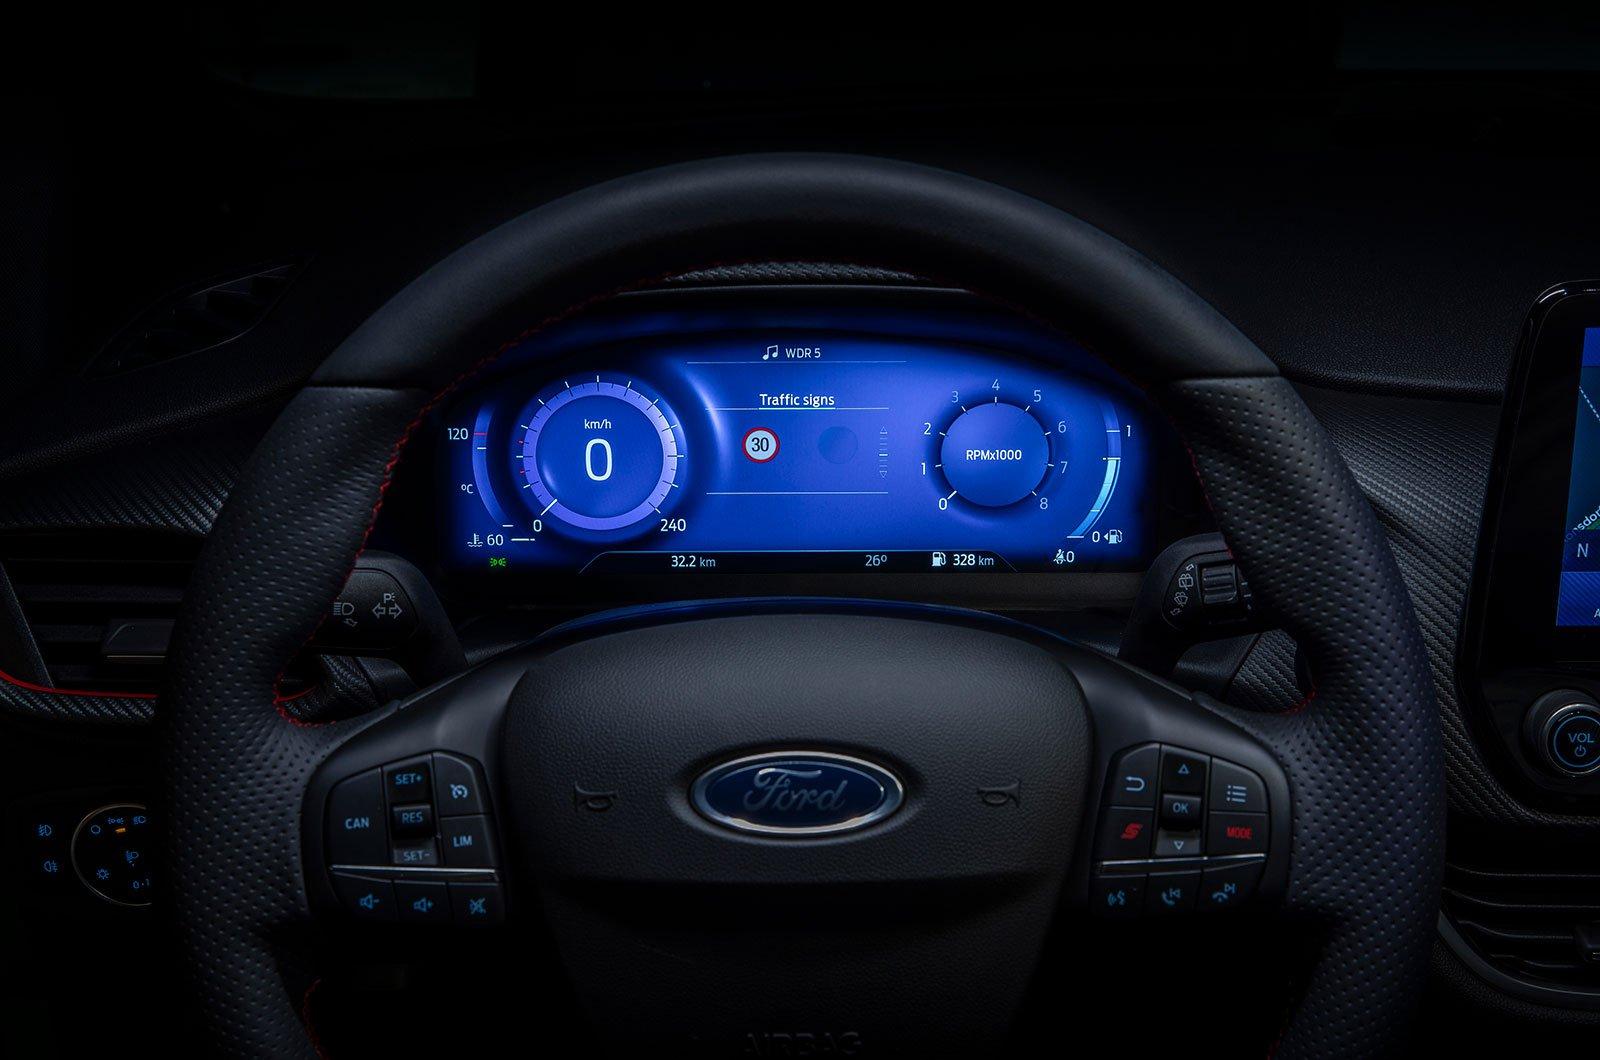 Ford Fiesta digital instruments